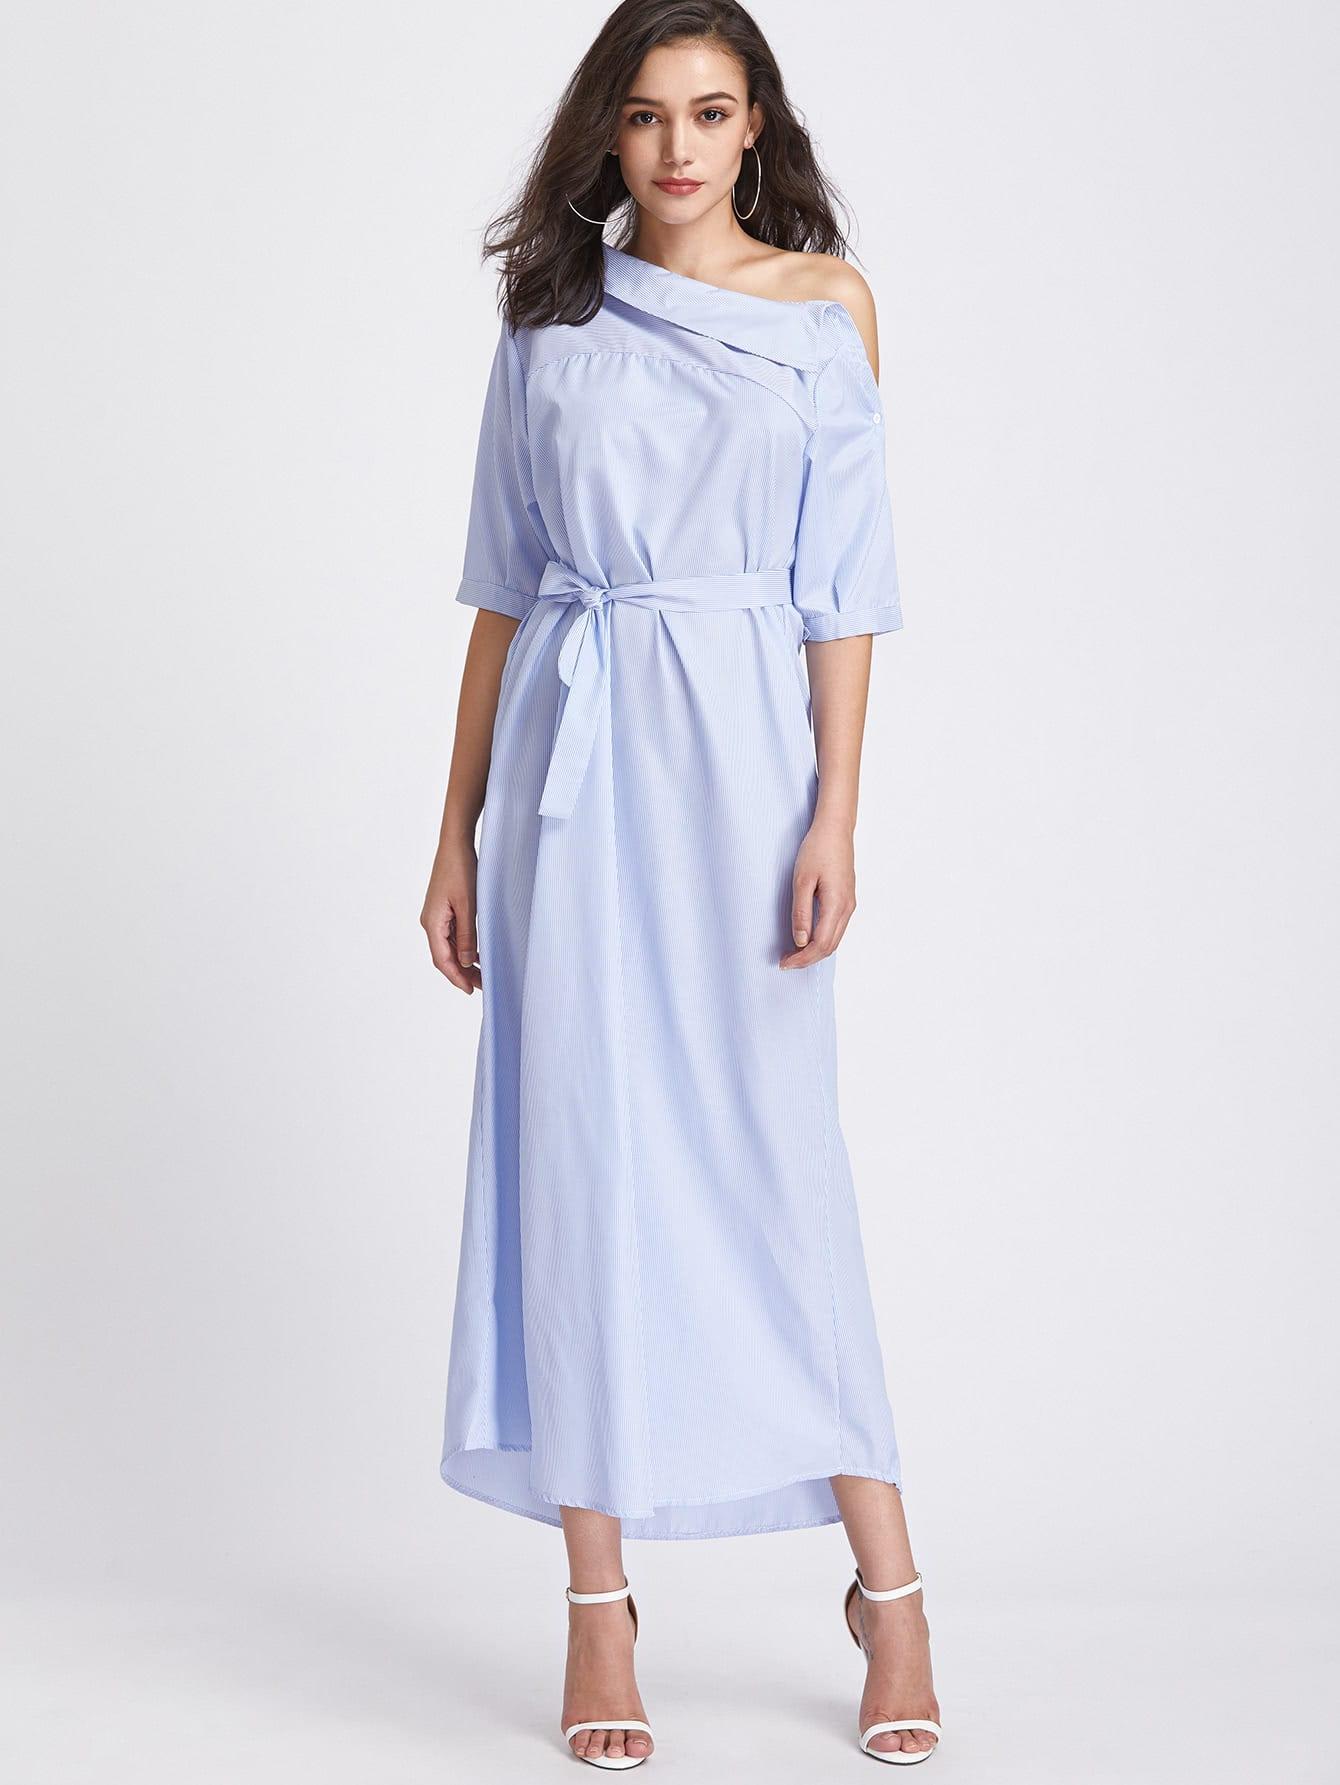 Pinstripe Asymmetrical Off Shoulder Self Tie Dress sweetheart off shoulder asymmetrical bodycon dress